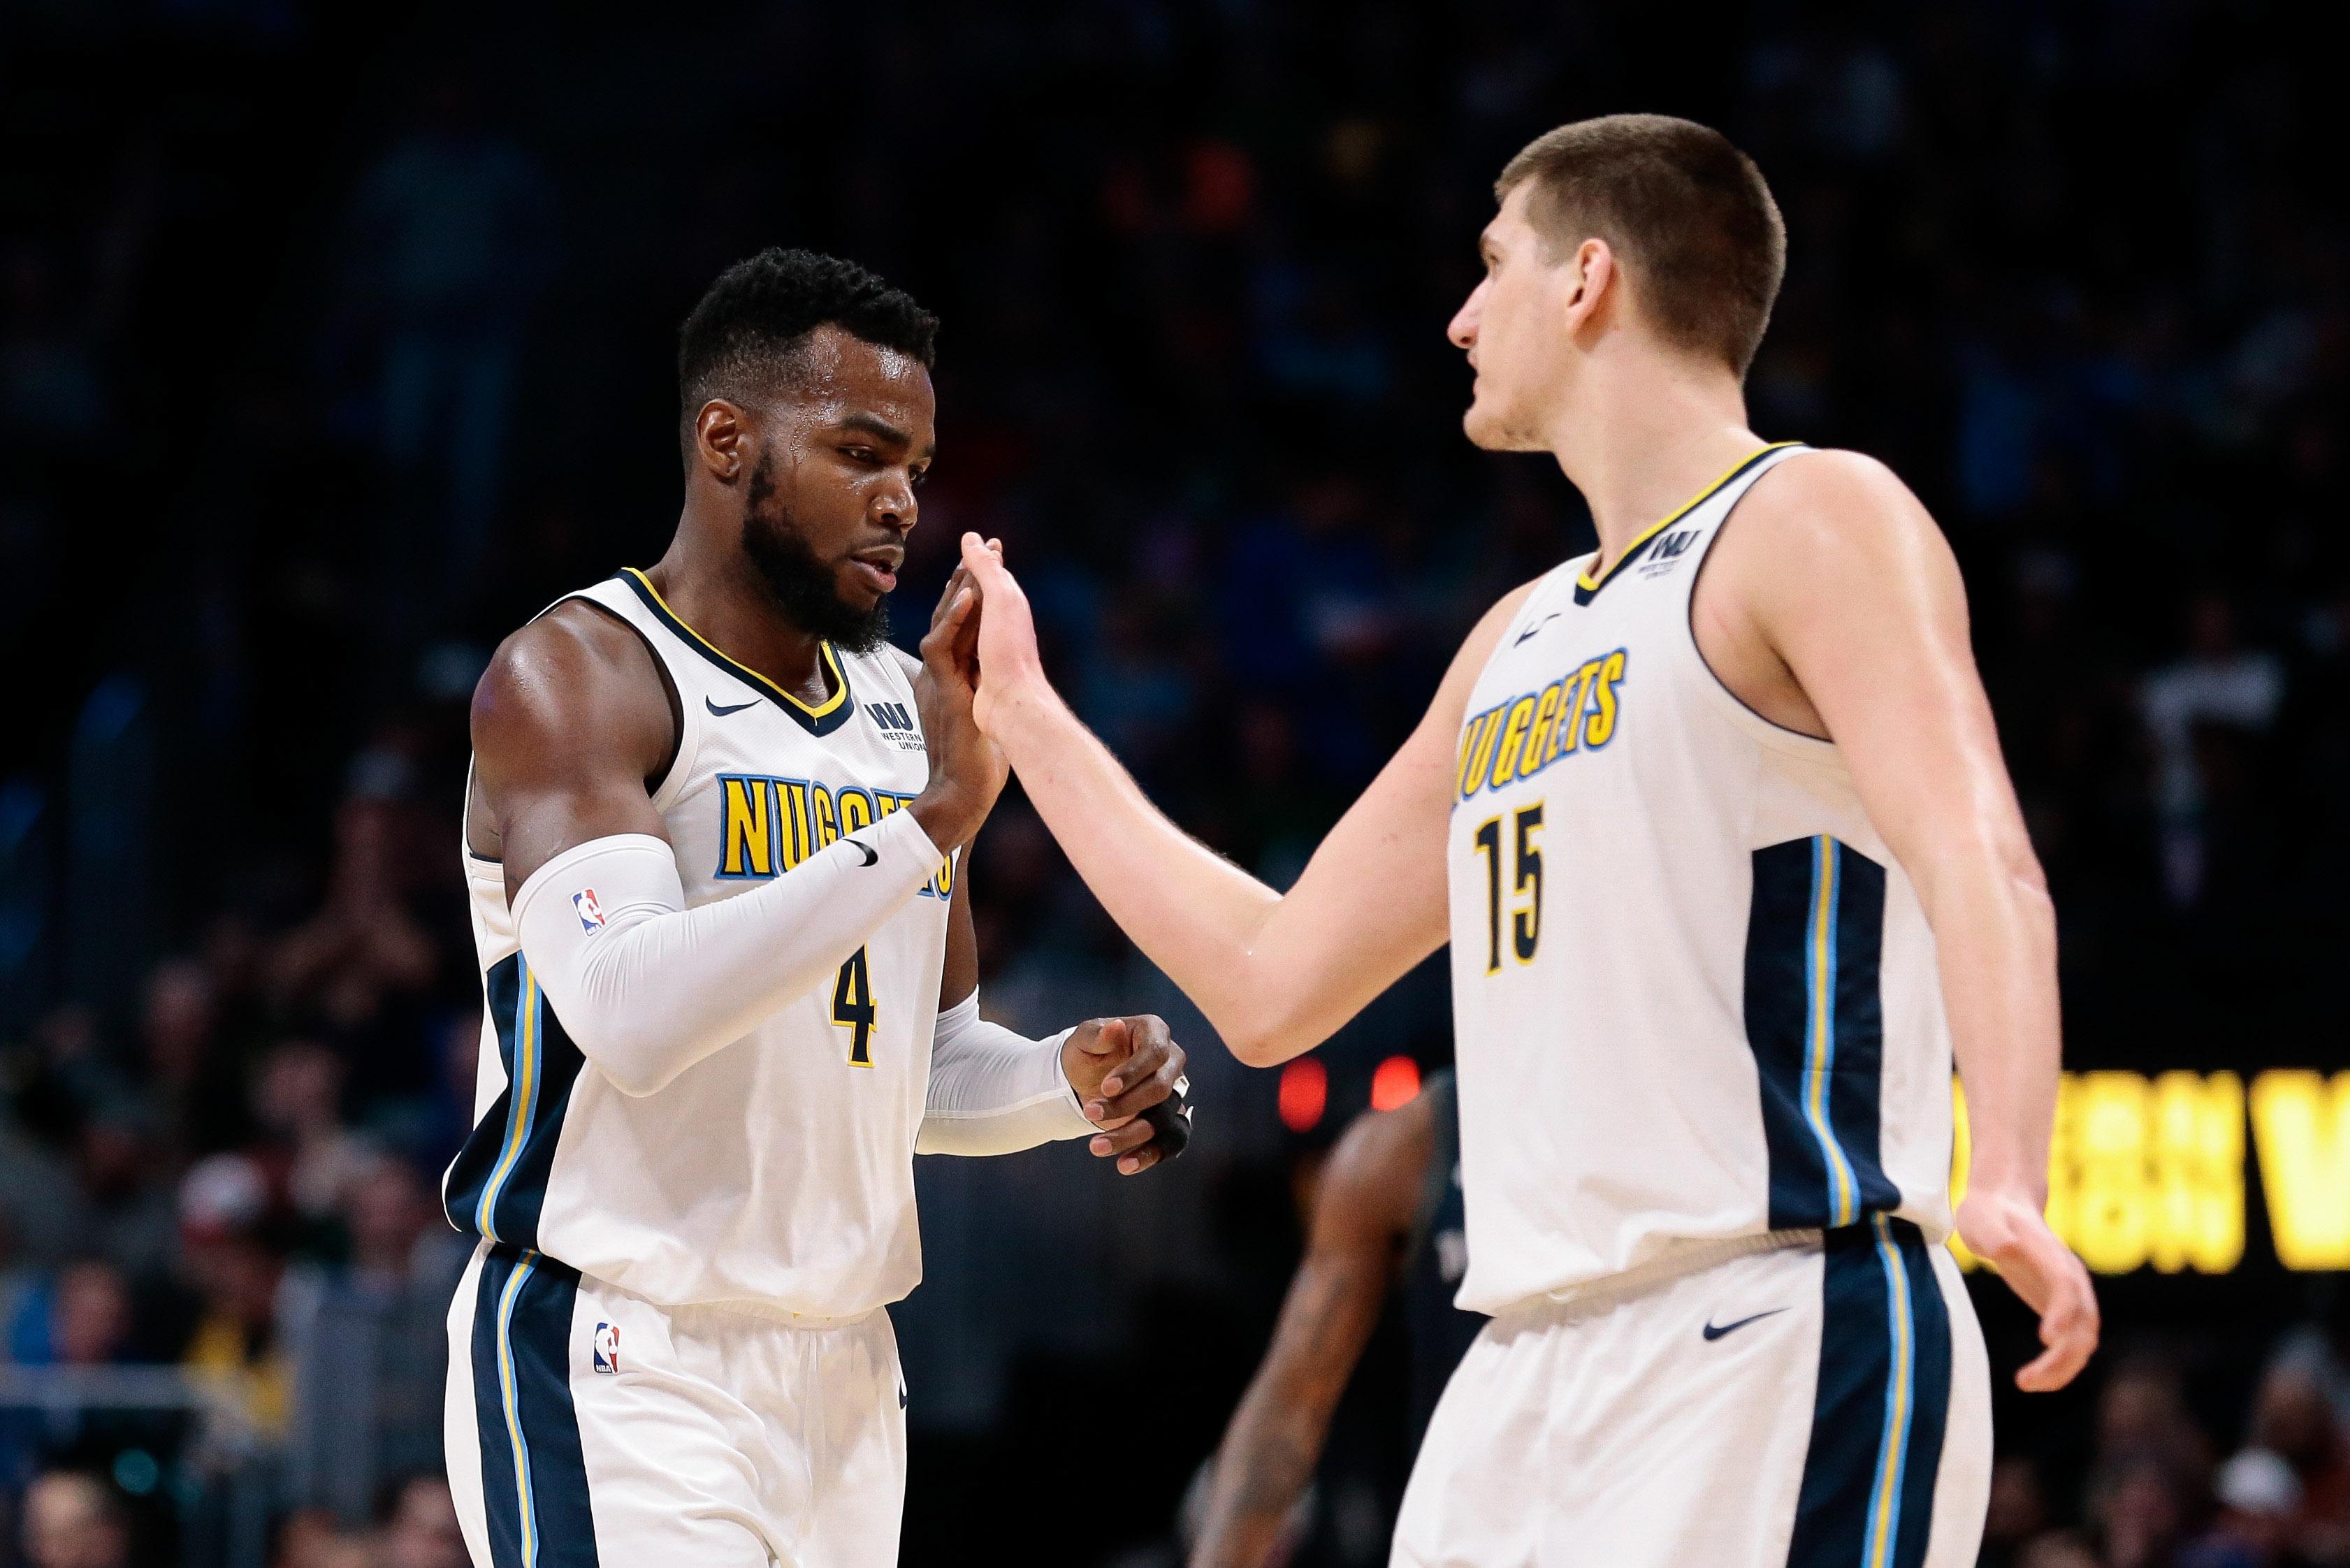 Denver Nuggets forward Paul Millsap (4) reacts with center Nikola Jokic (15) in the third quarter against the Detroit Pistons